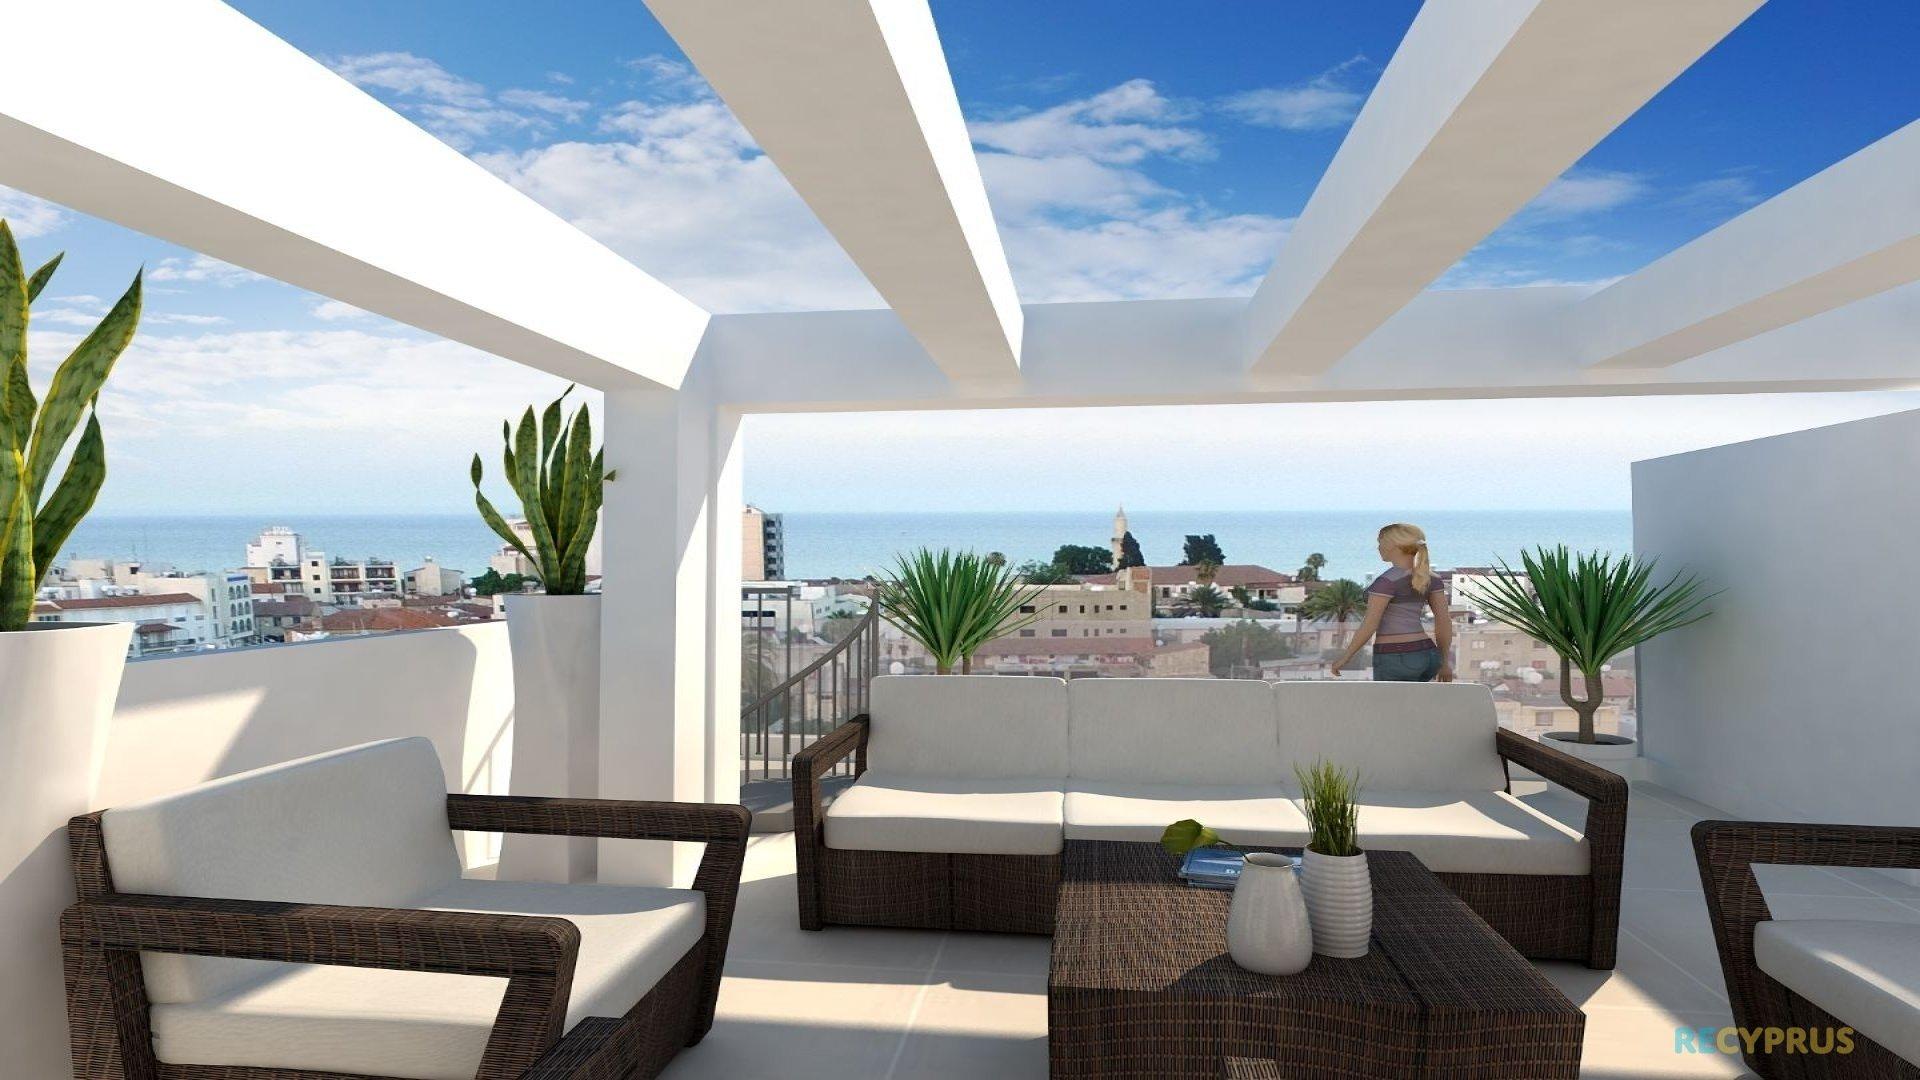 Apartment for sale City Center Larnaca Cyprus 10 3596